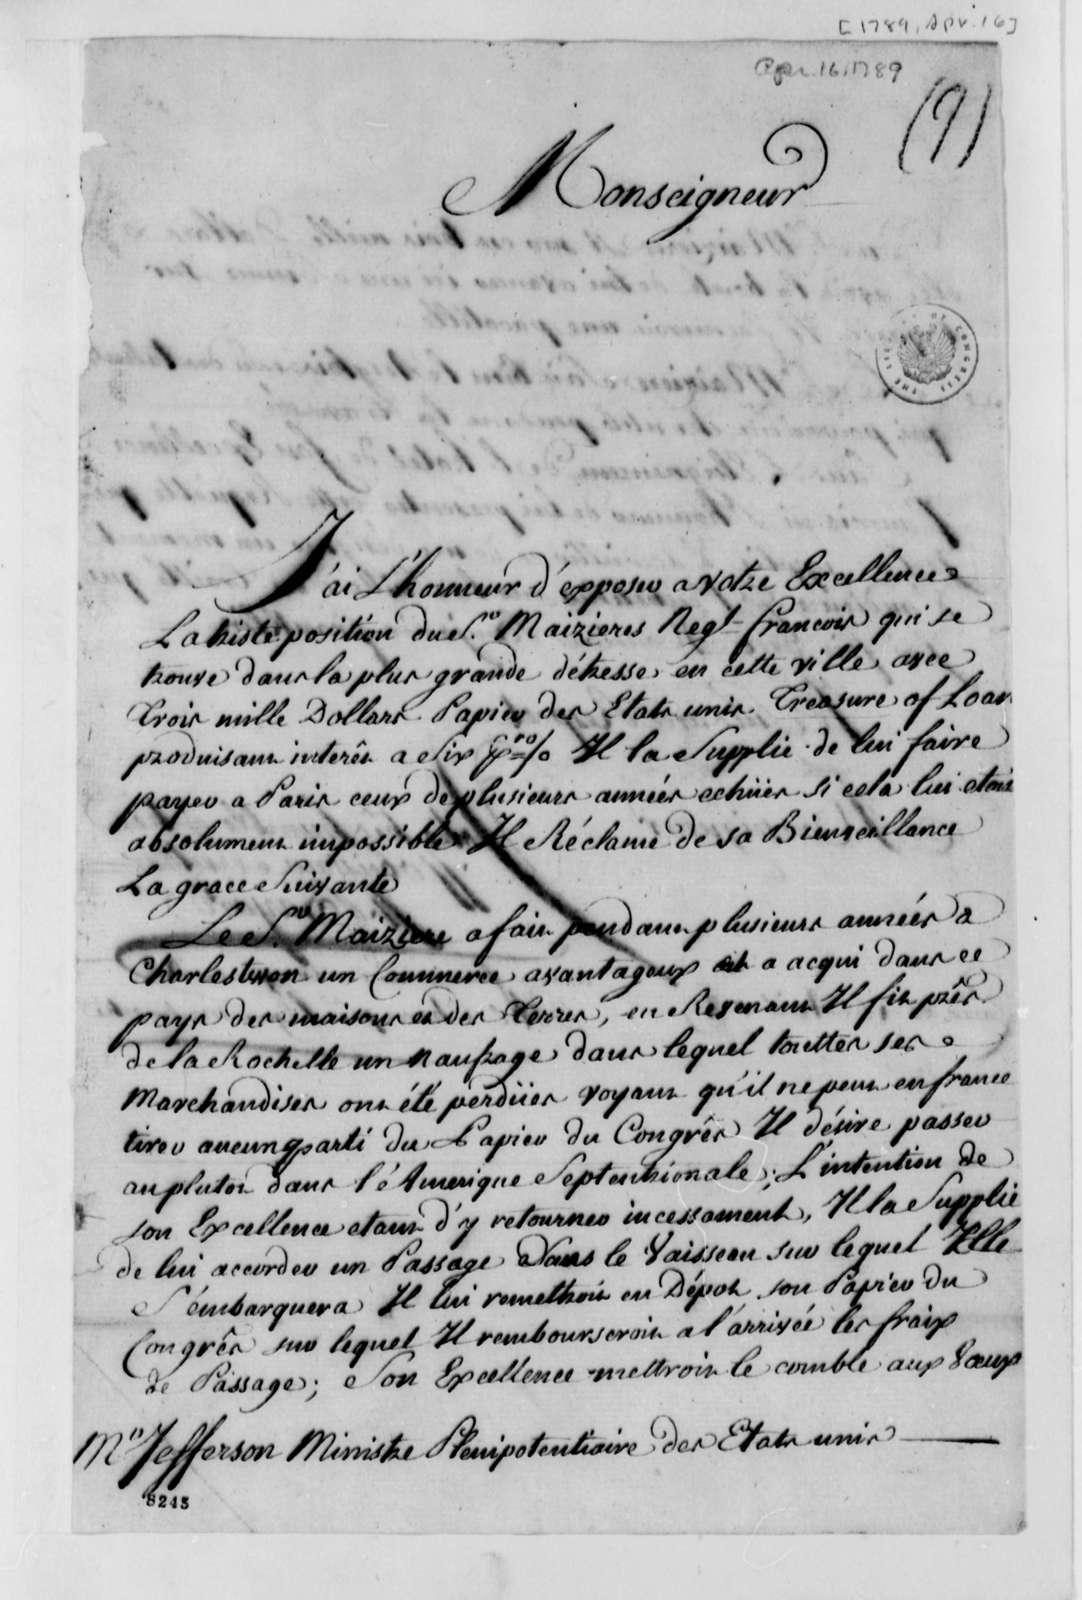 James A. Bayard to Thomas Jefferson, April 16, 1789, in French